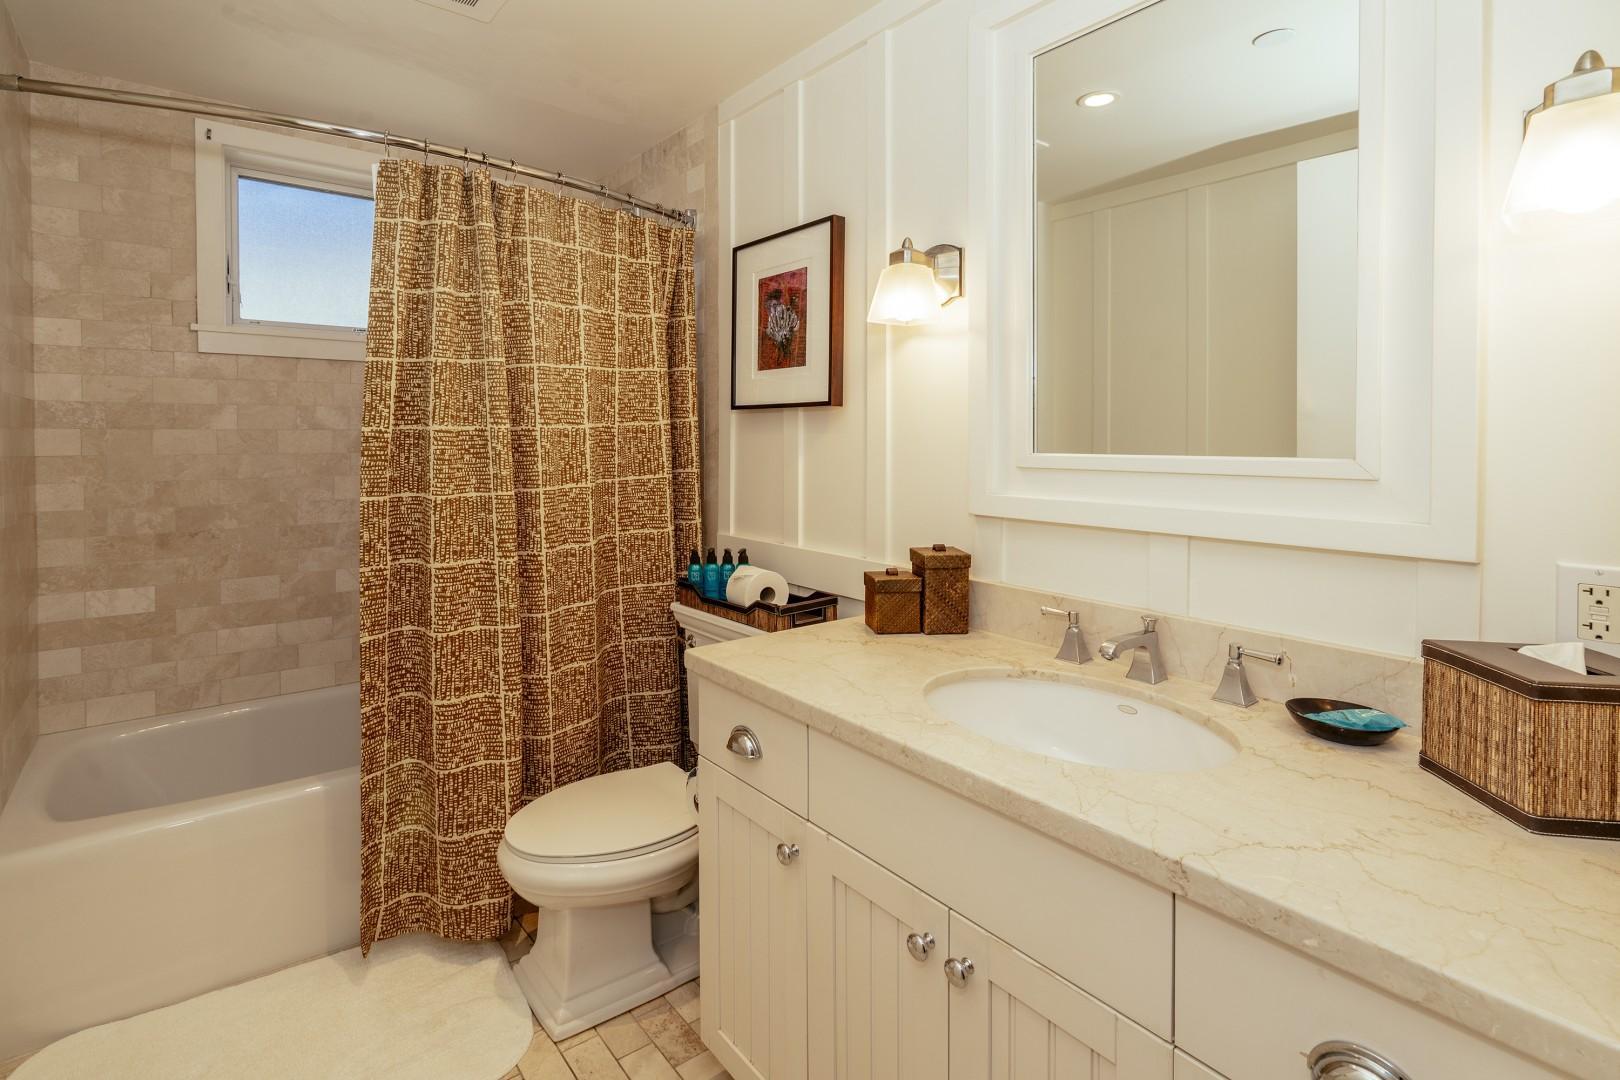 Full size guest bathroom.